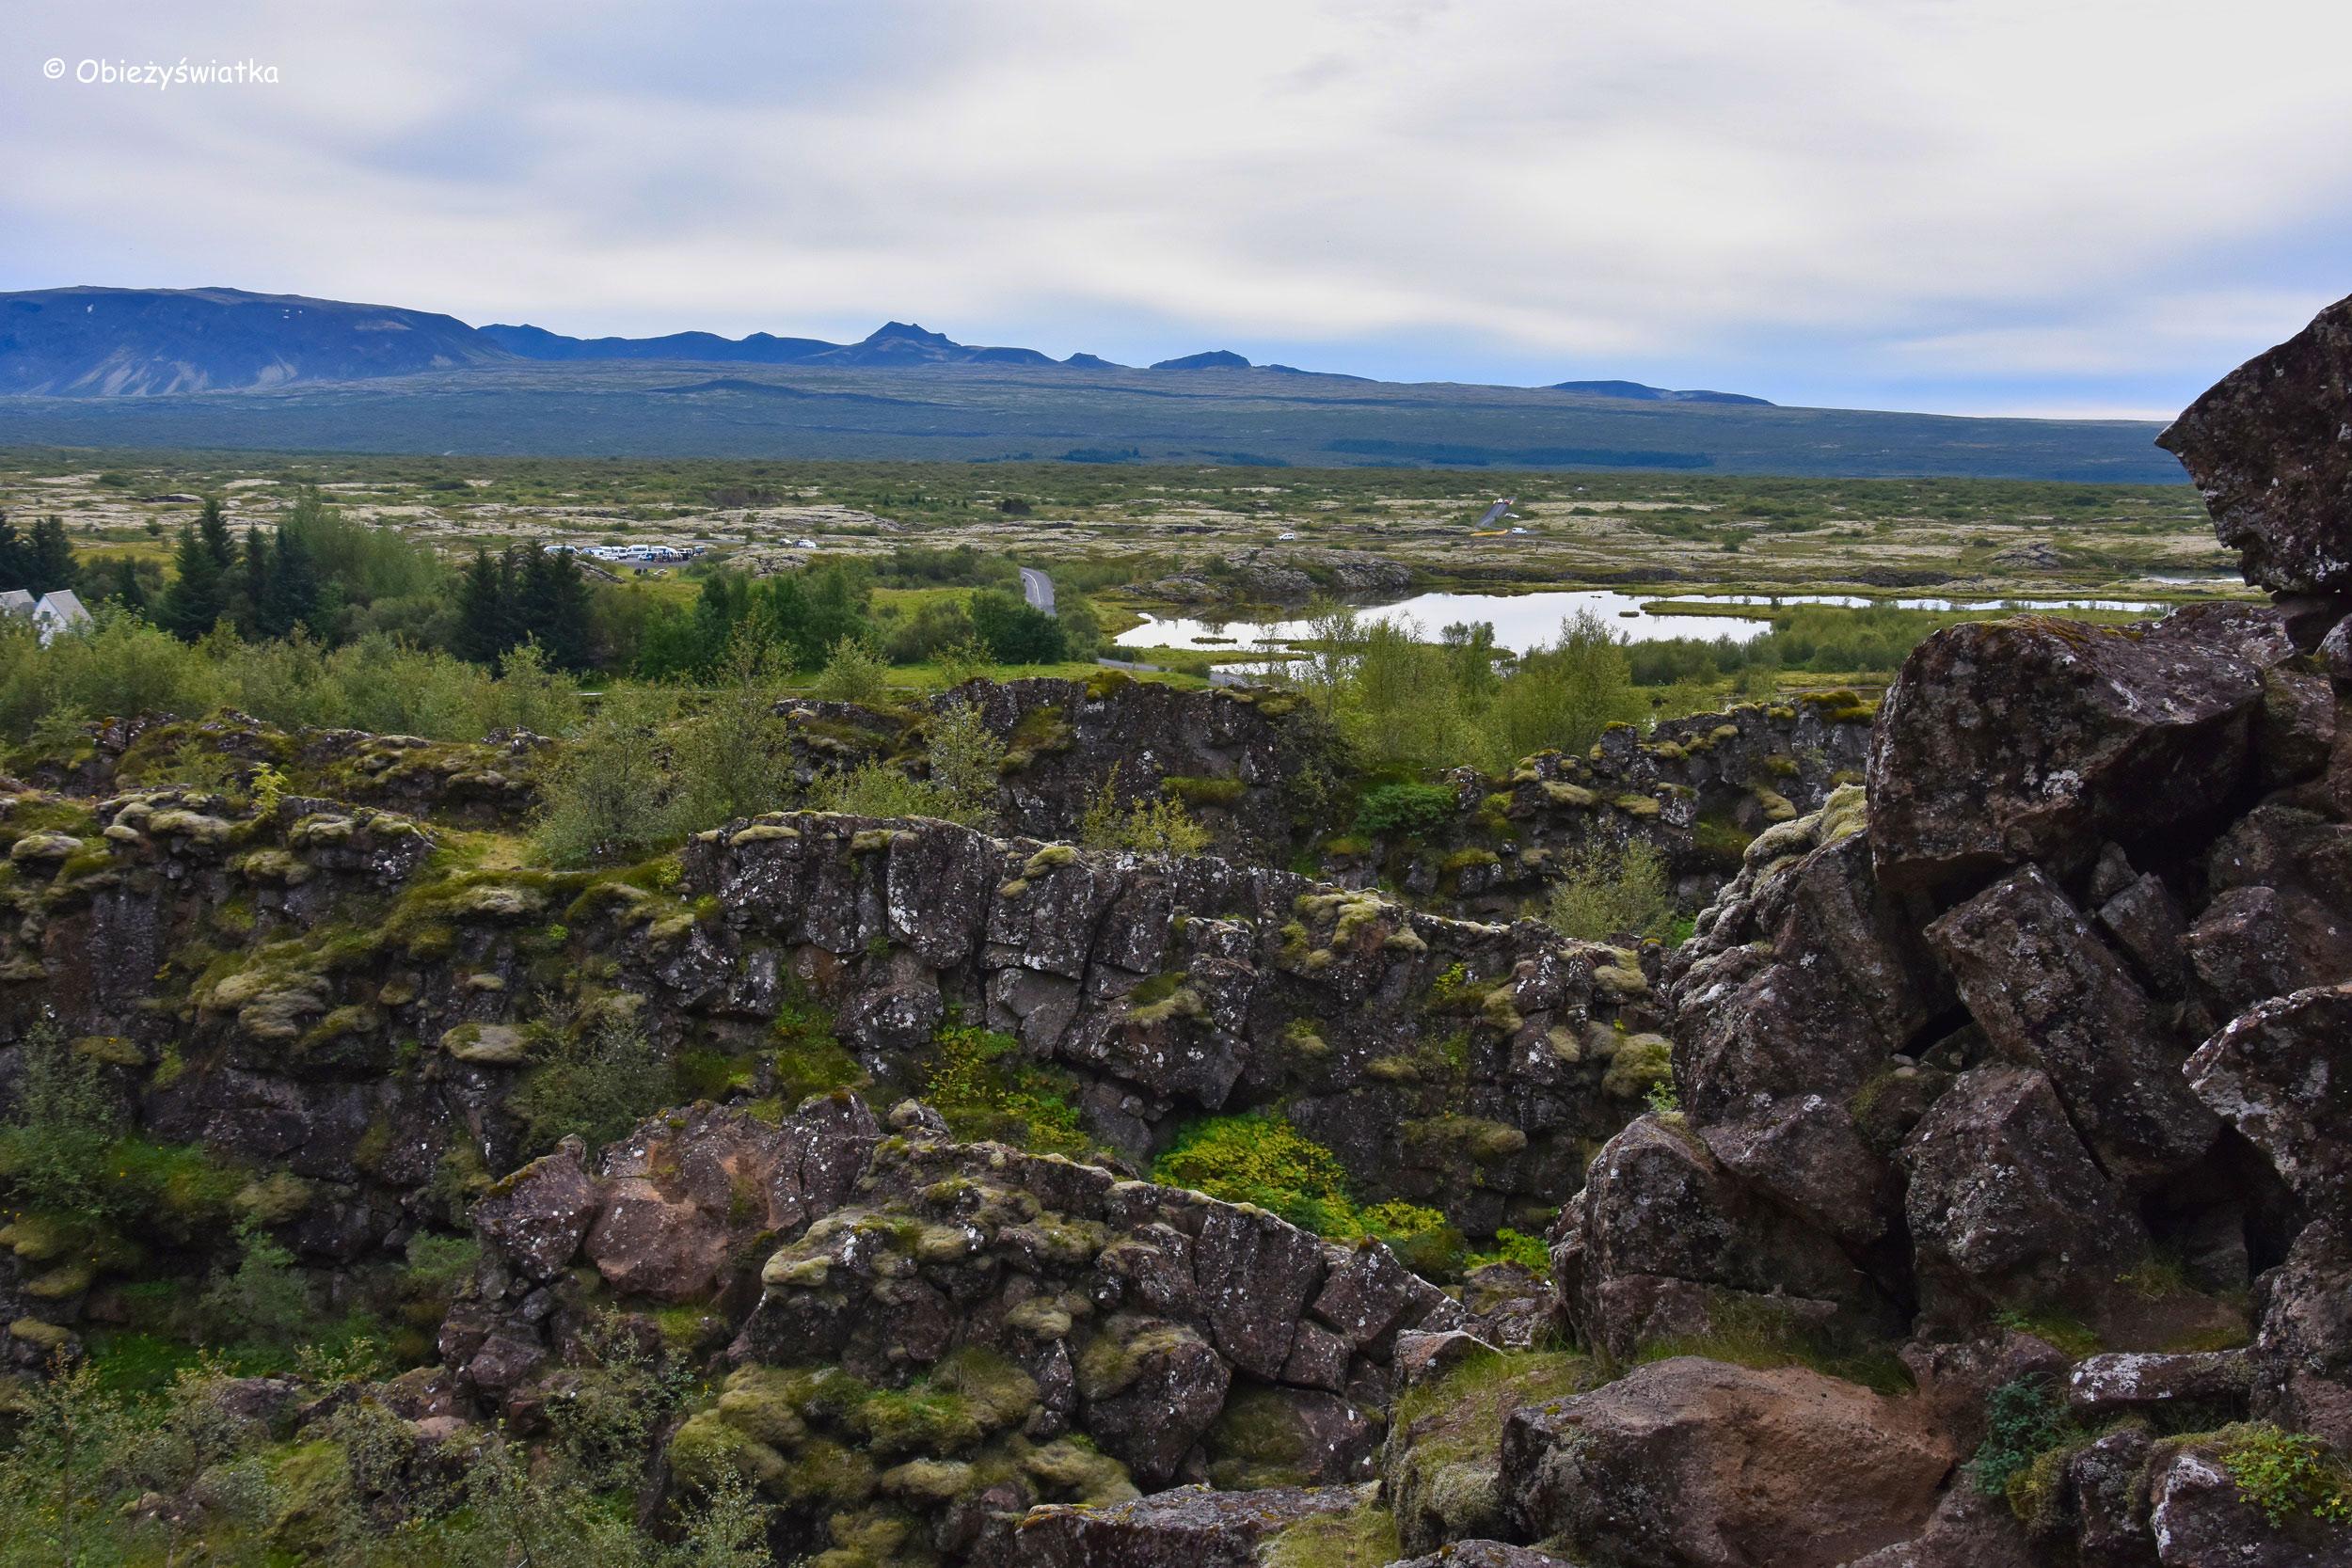 Krajobraz parku narodowego Þingvellir, Islandia